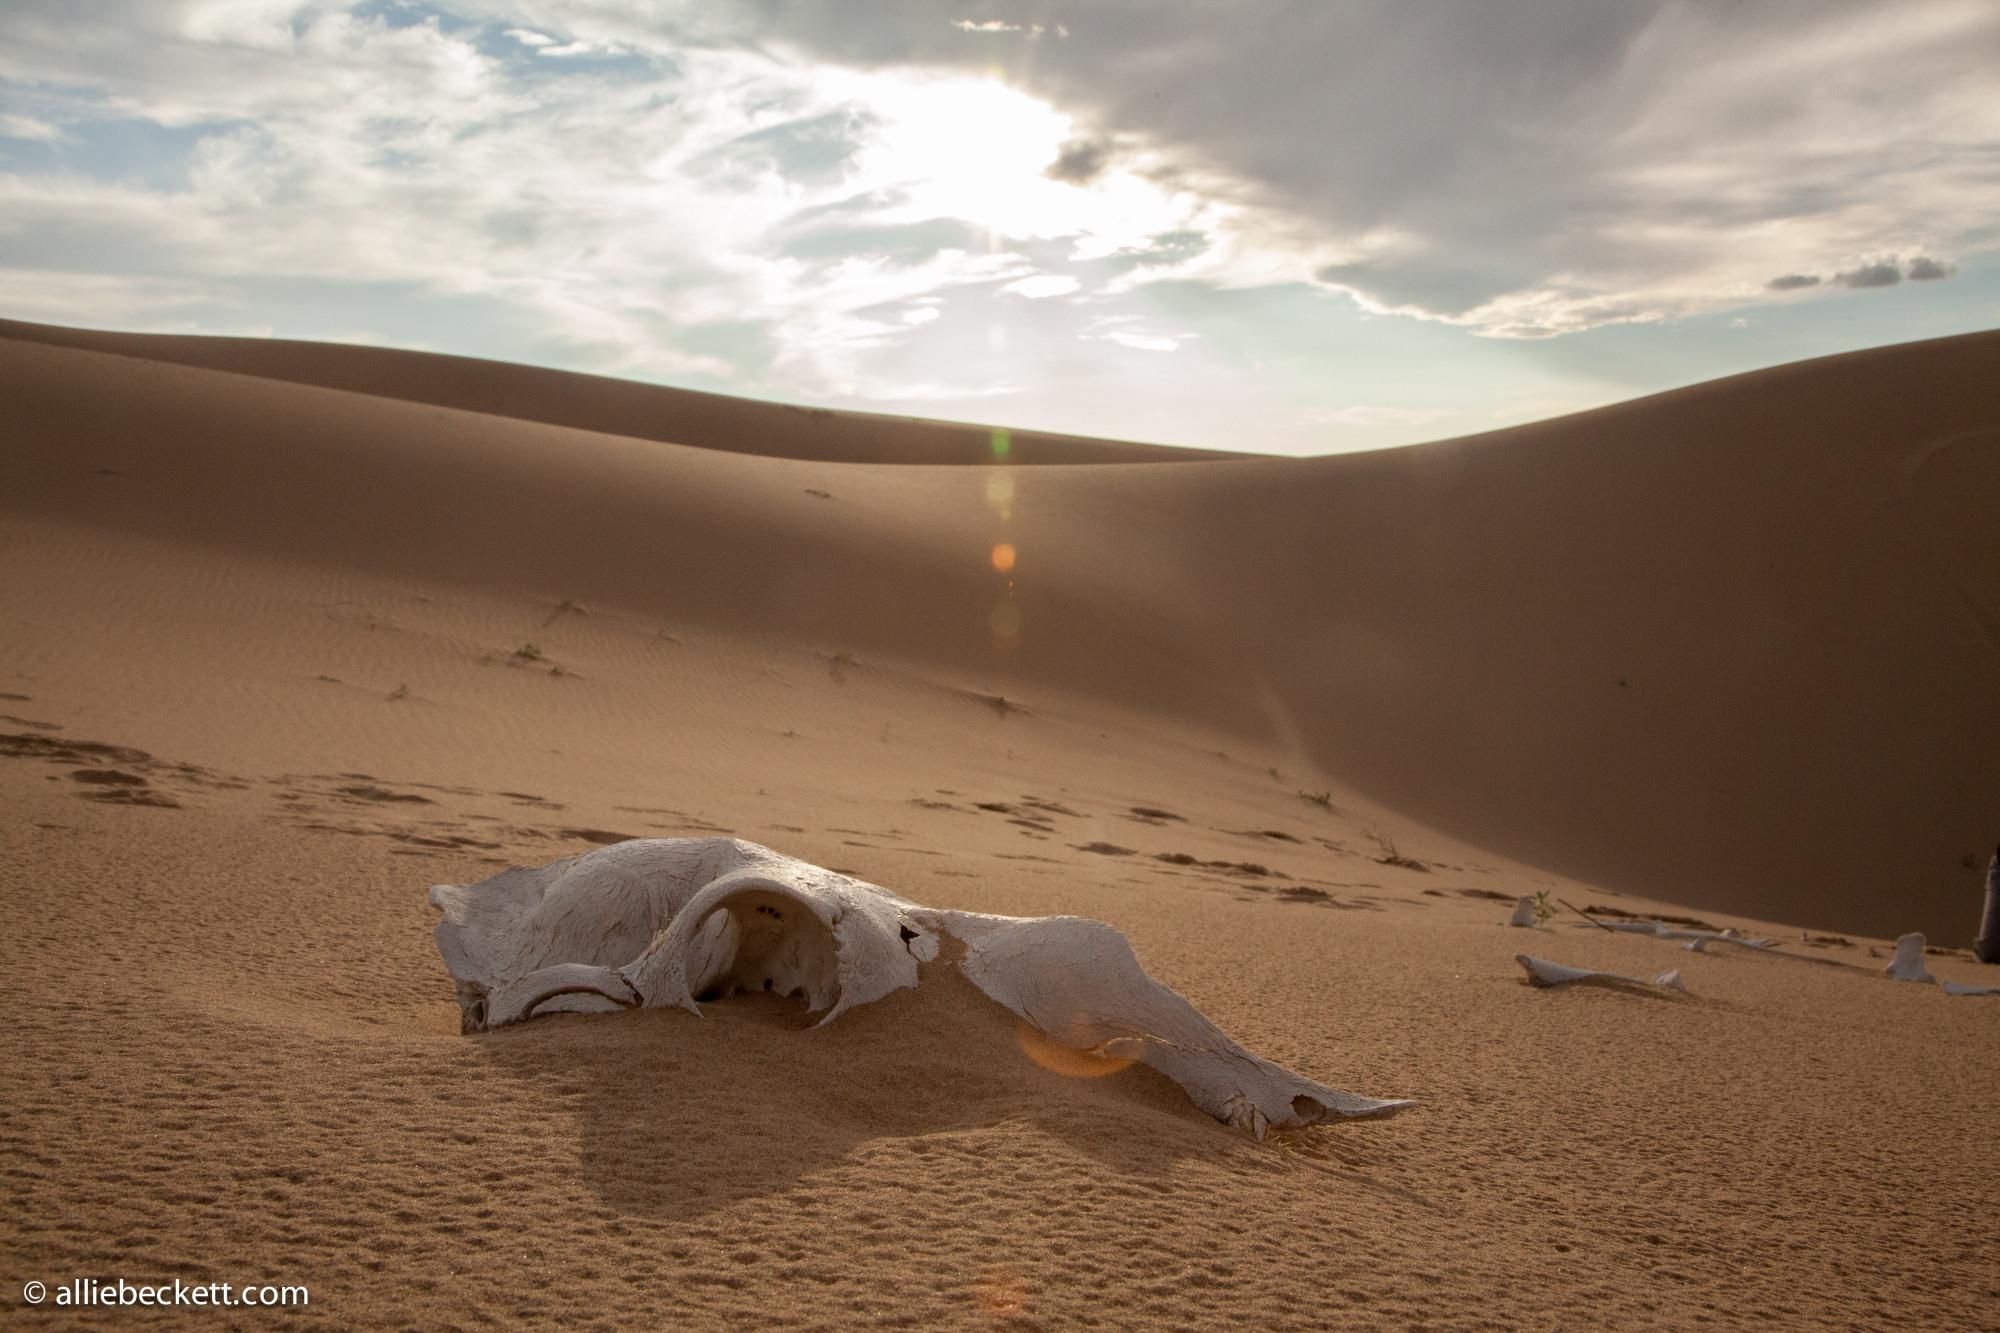 a paper on the gobi desert The gobi desert is a • monocle • mushroom • music • newspaper • notebook • onion • paint • paintbrush • painting • pamphlet • paper money.